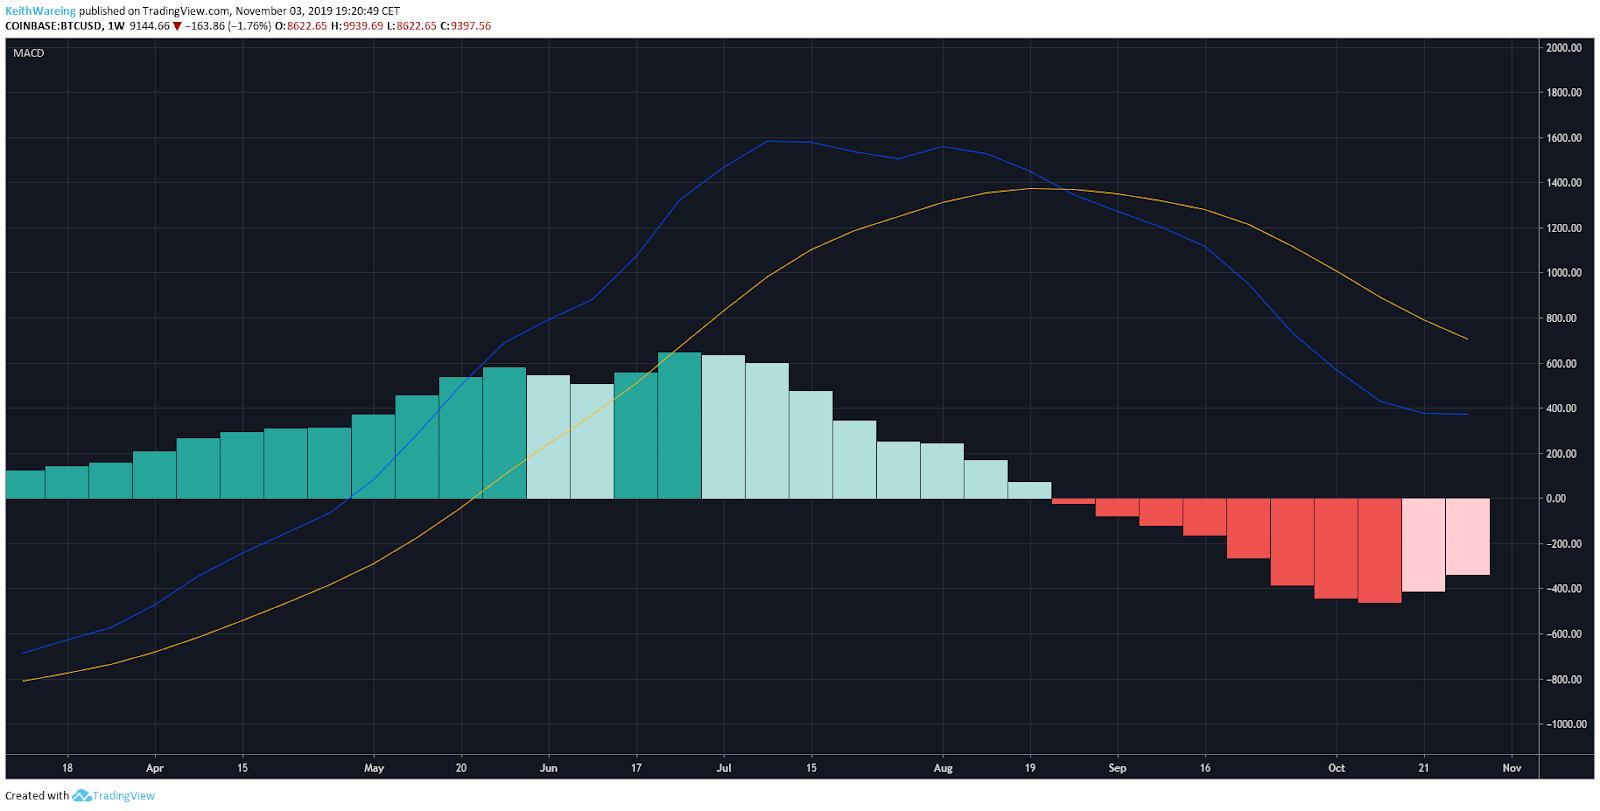 BTC Wochen-MACD in USD